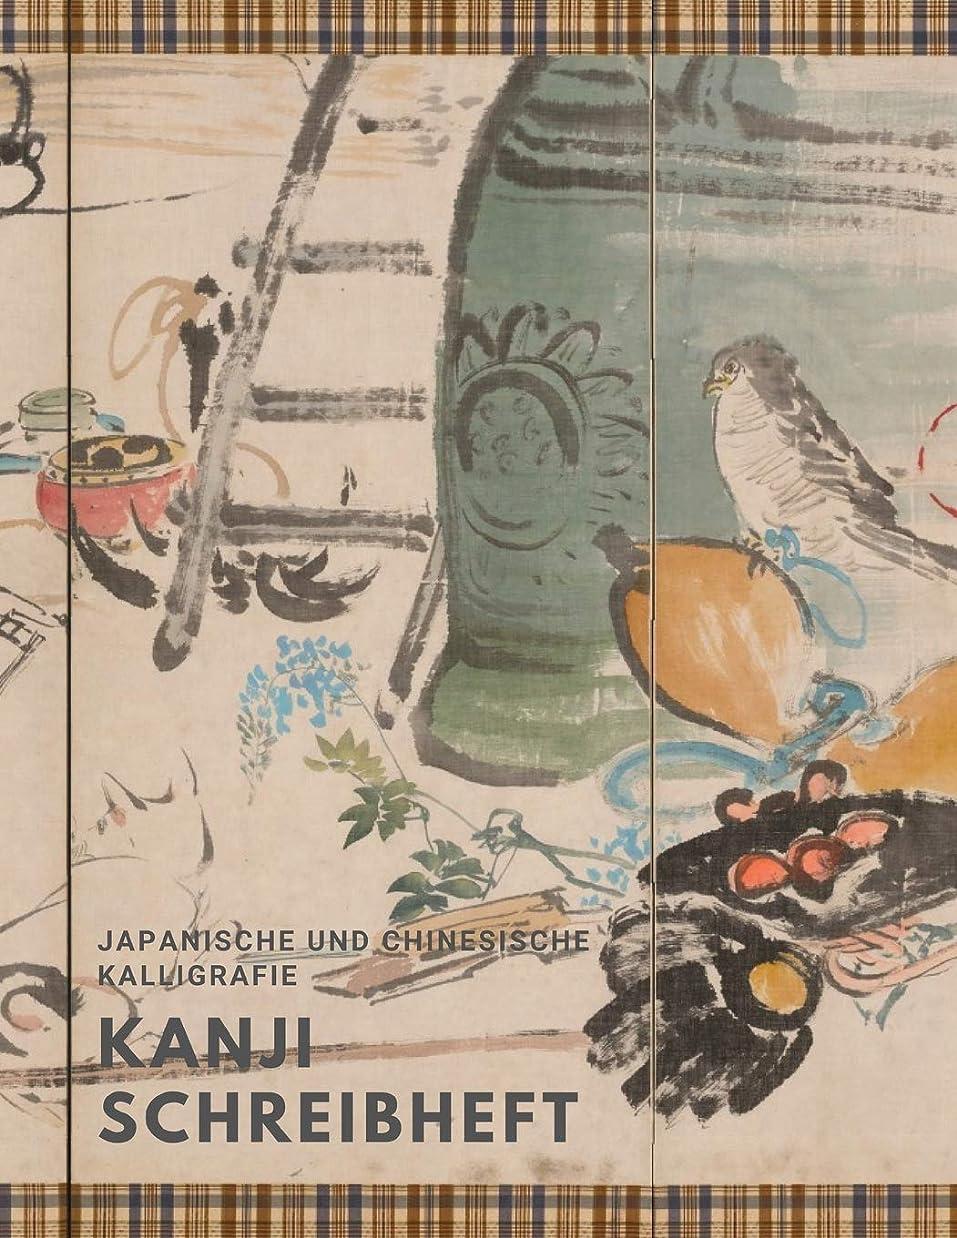 飢えた飢え難民Japanische und Chinesische Kalligrafie: Japanisch schreiben lernen, Blanko Kanji Schreibheft